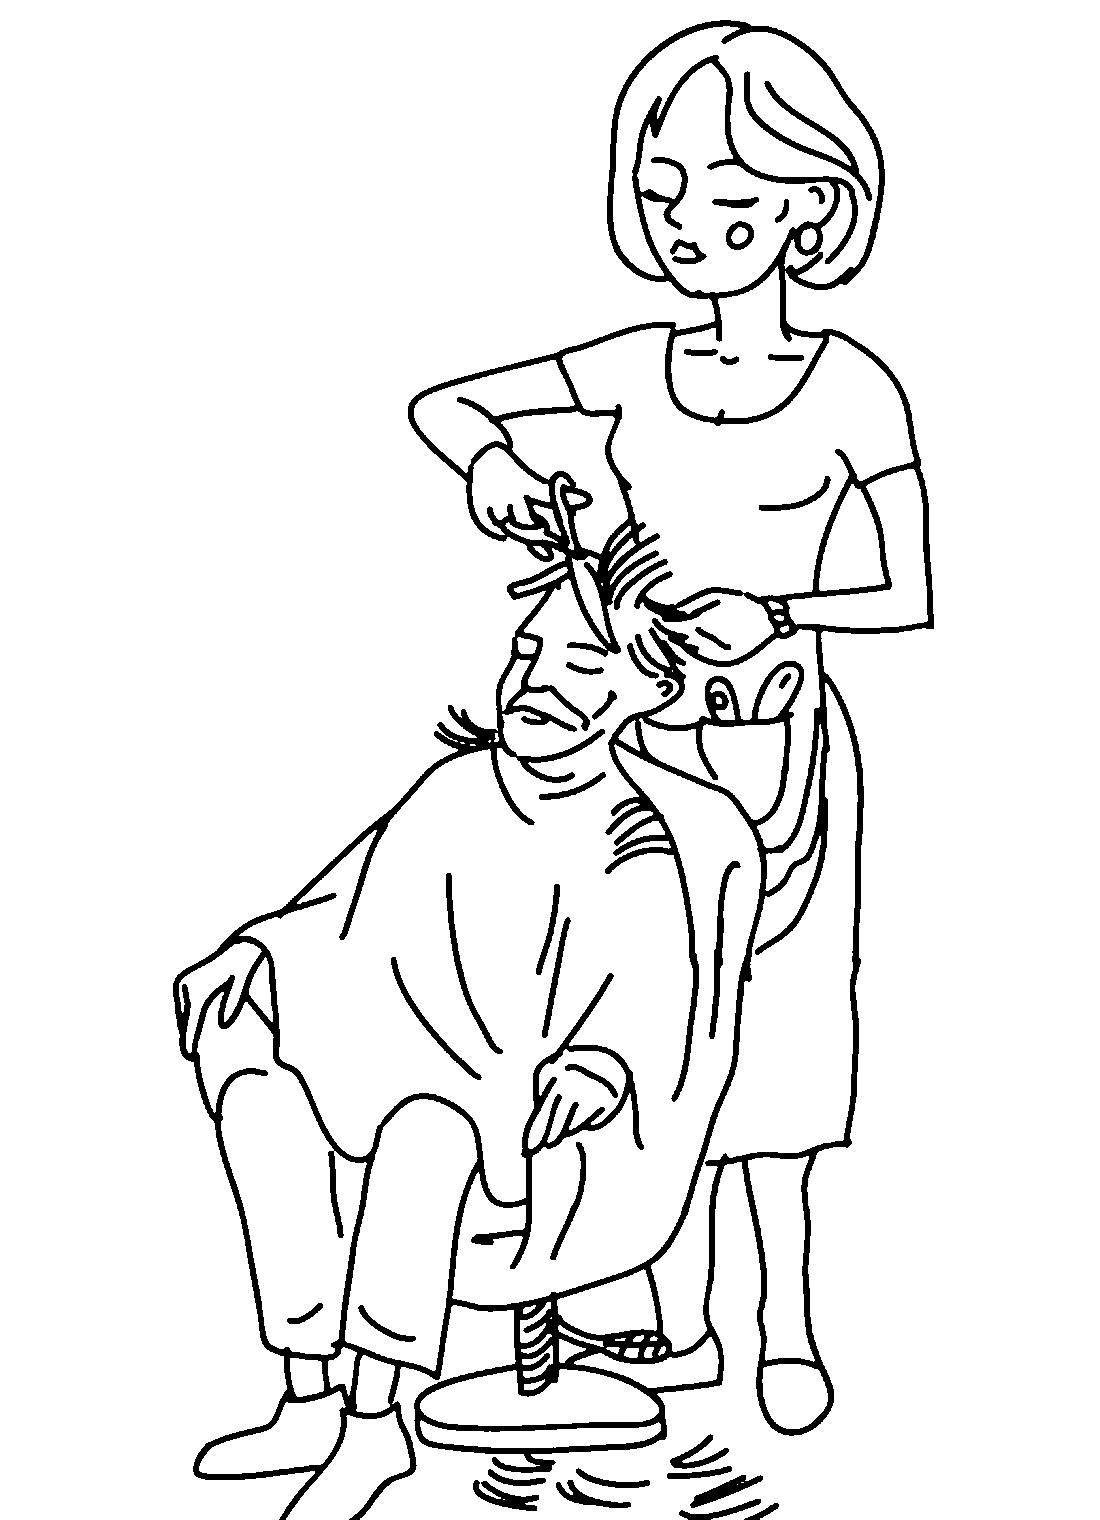 Рисунок парикмахера картинки